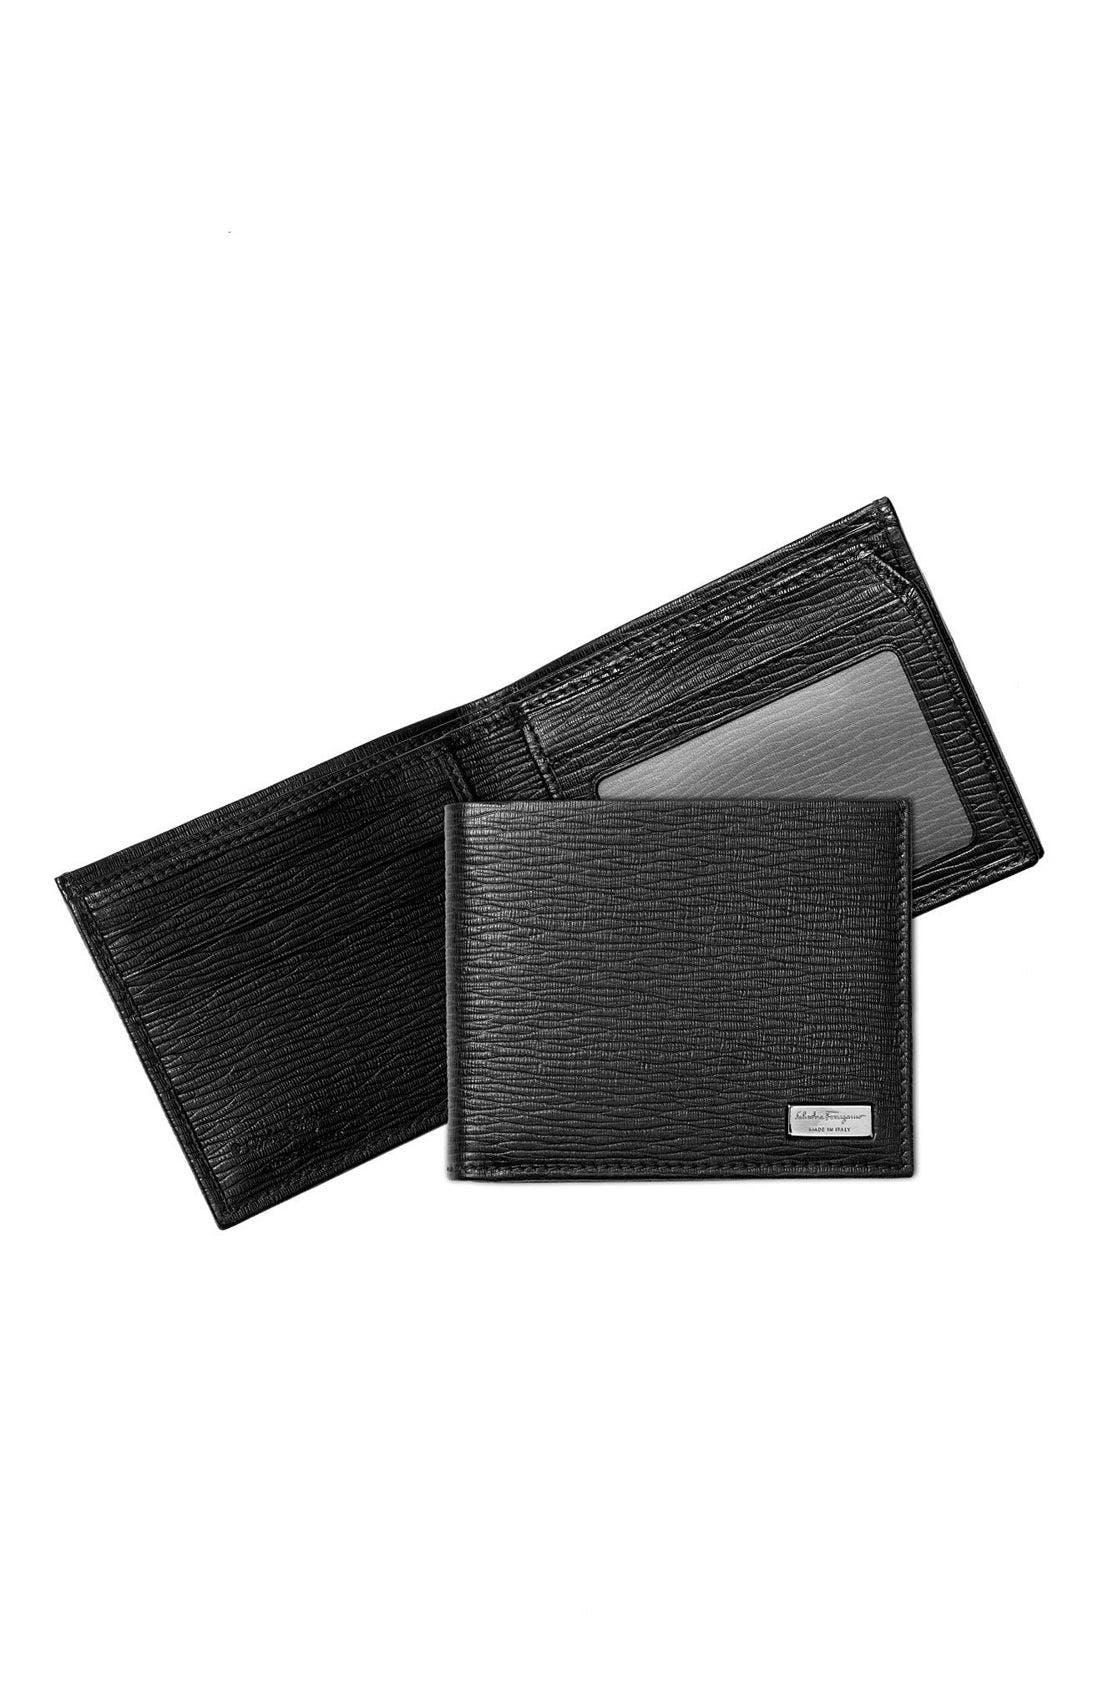 Stamped Calf Wallet,                             Alternate thumbnail 2, color,                             BLACK